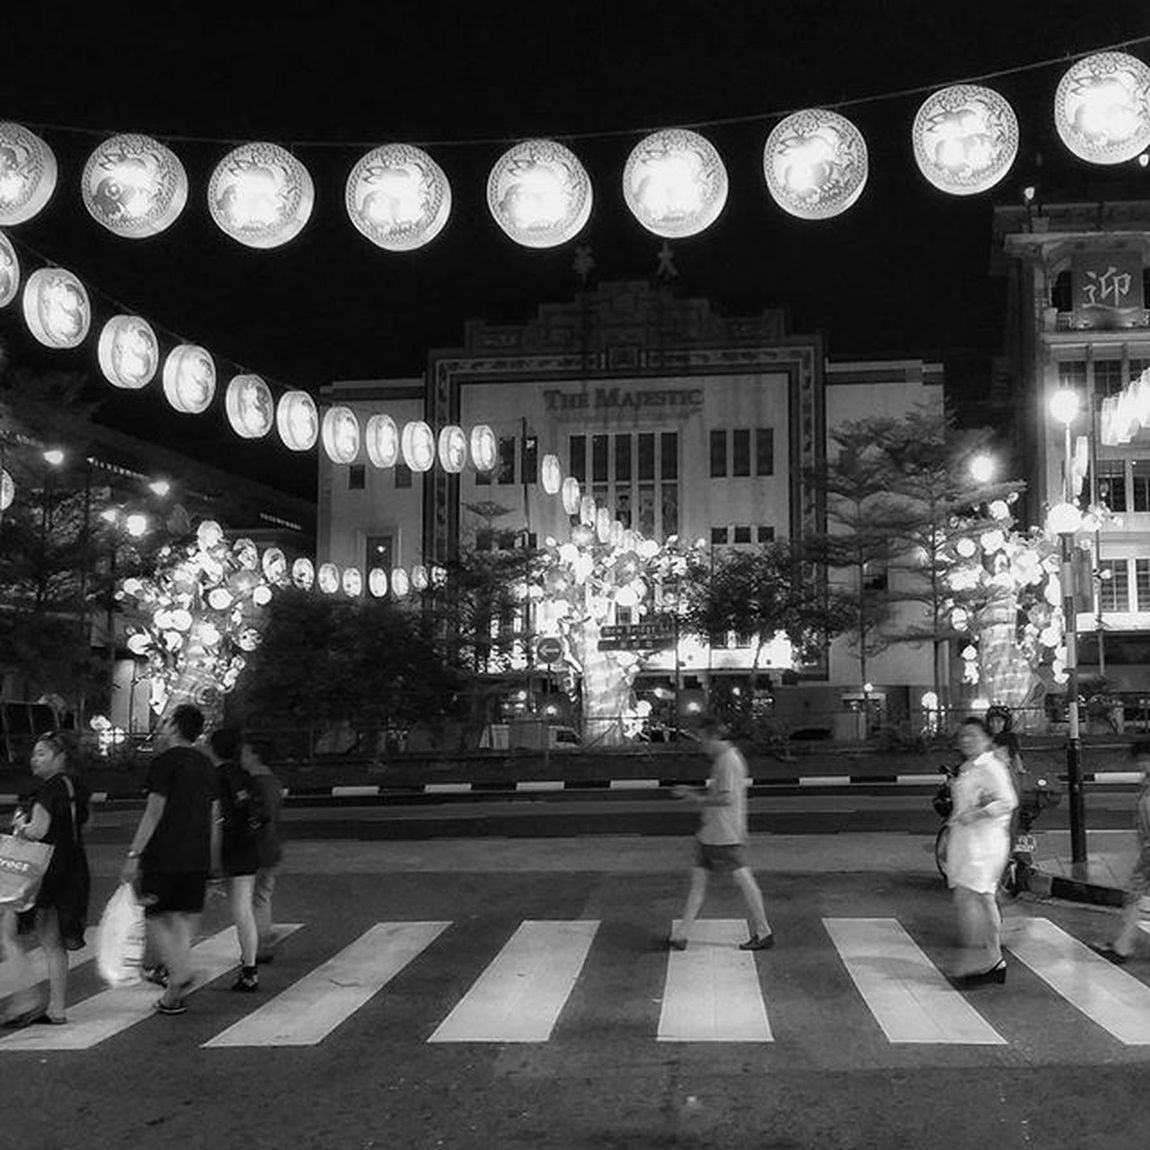 Chinesenewyear Cny Chinatown Singapore Insta_sg Instapic Night Photography Instagramers Instagram Igersmyanmar Snapseed Nightlife Road Jan25 Cars Carsontheroad Yearofmonkeys Yearofthemonkey Yearofthemonkey2016 Yearofthegoat is Over Sg Instasg The Tourist